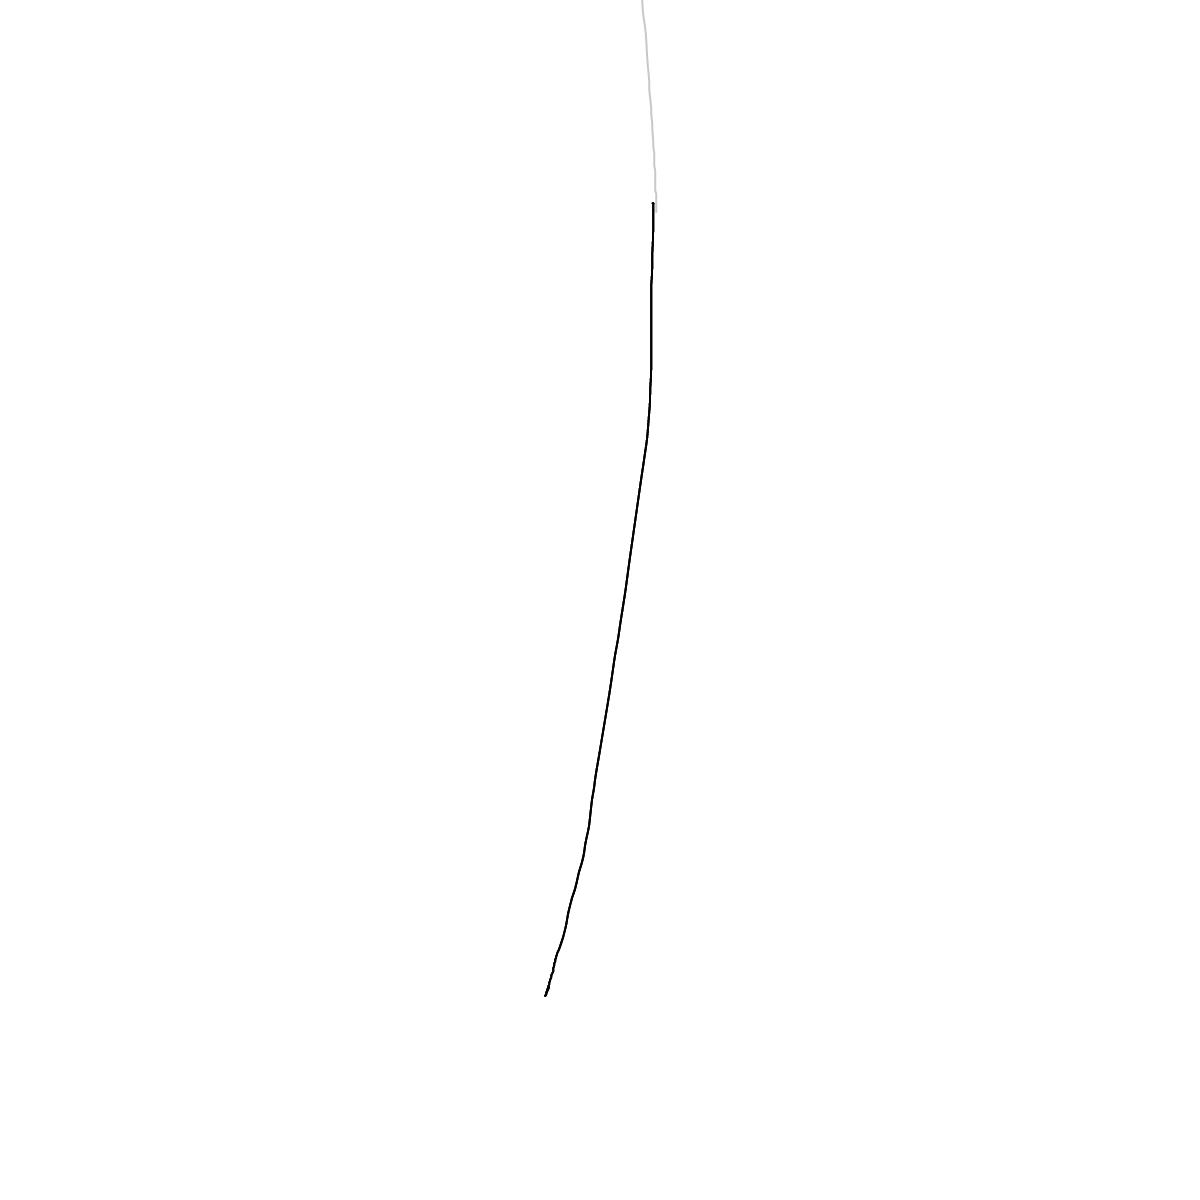 BAAAM drawing#18082 lat:40.7131423950195300lng: -74.0121078491211000